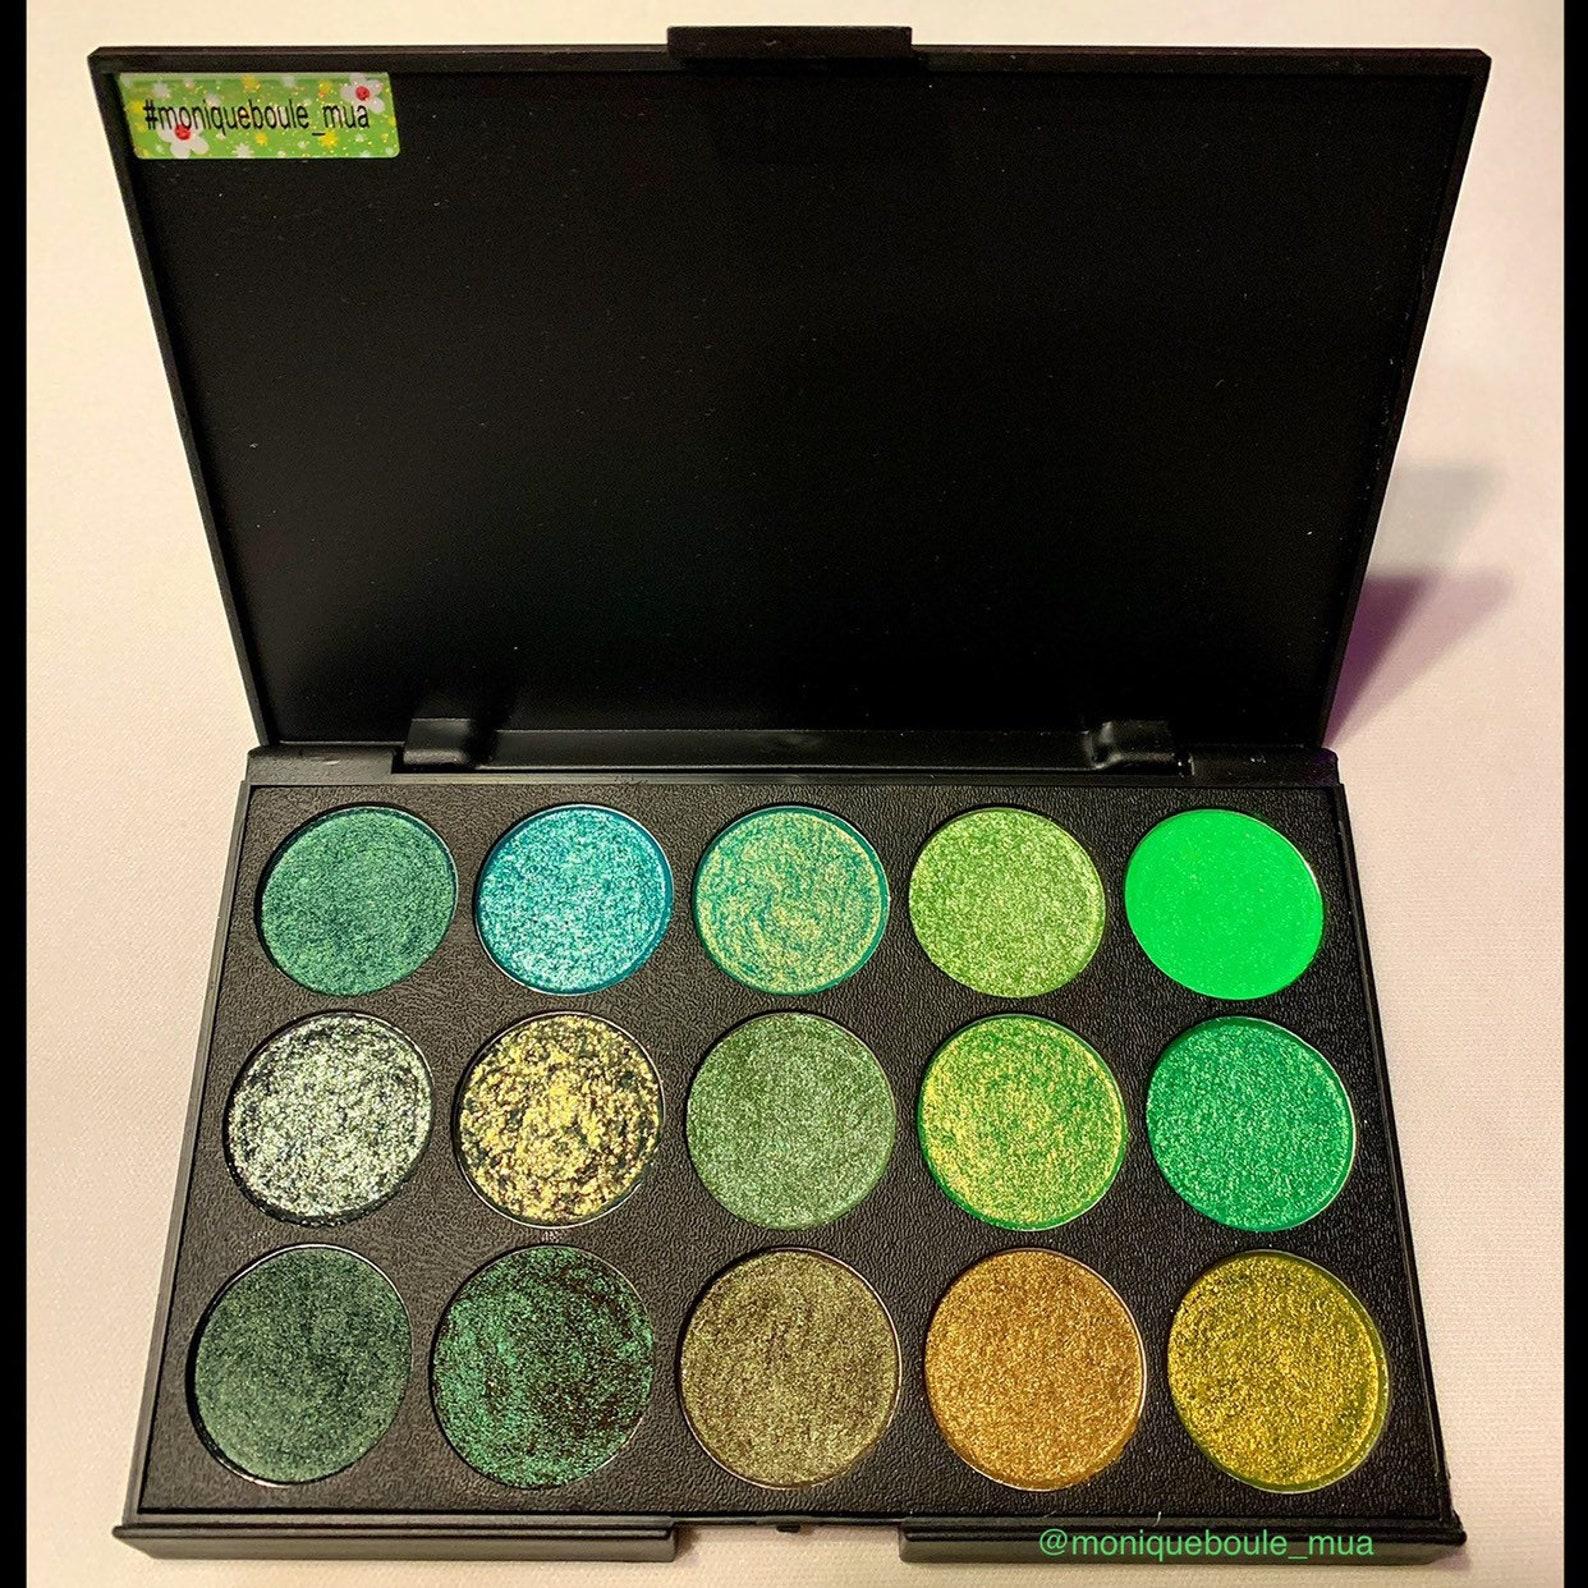 etsy.com - The Greens Vegan Eyeshadow Palette